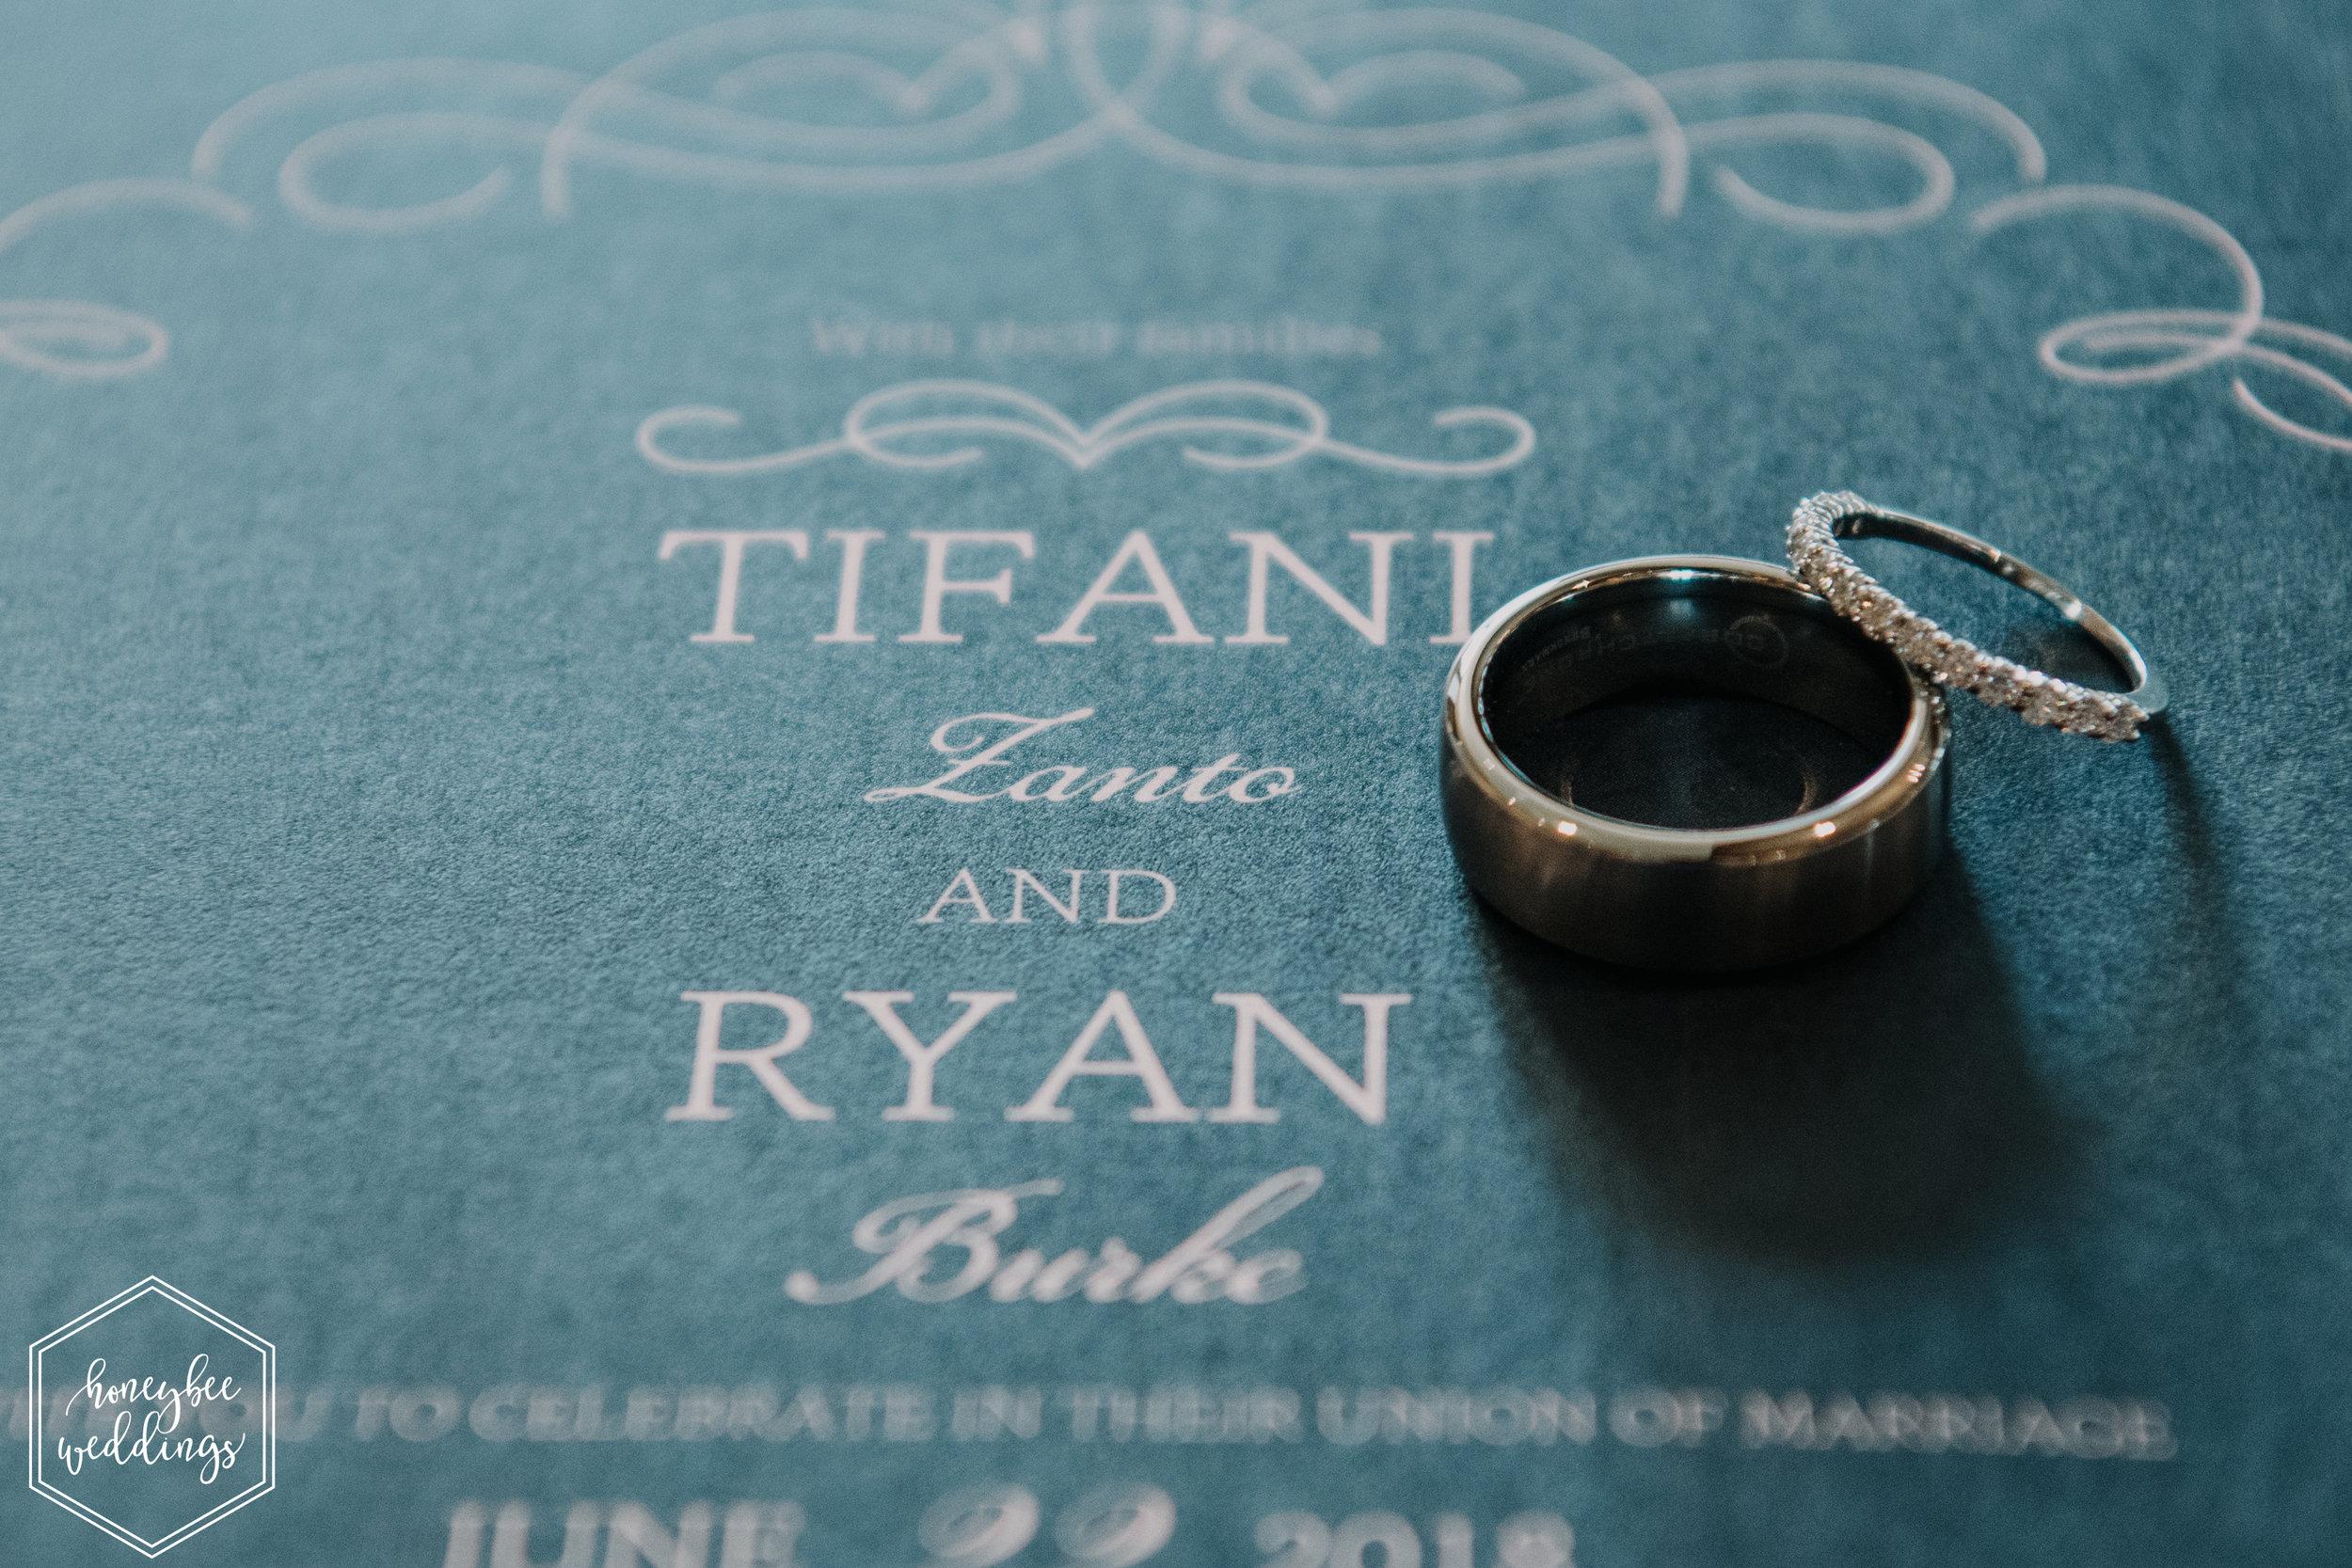 4 Montana Wedding Photographer_St. Francis Wedding_Tifani Zanto + Ryan Burke -4511.jpg